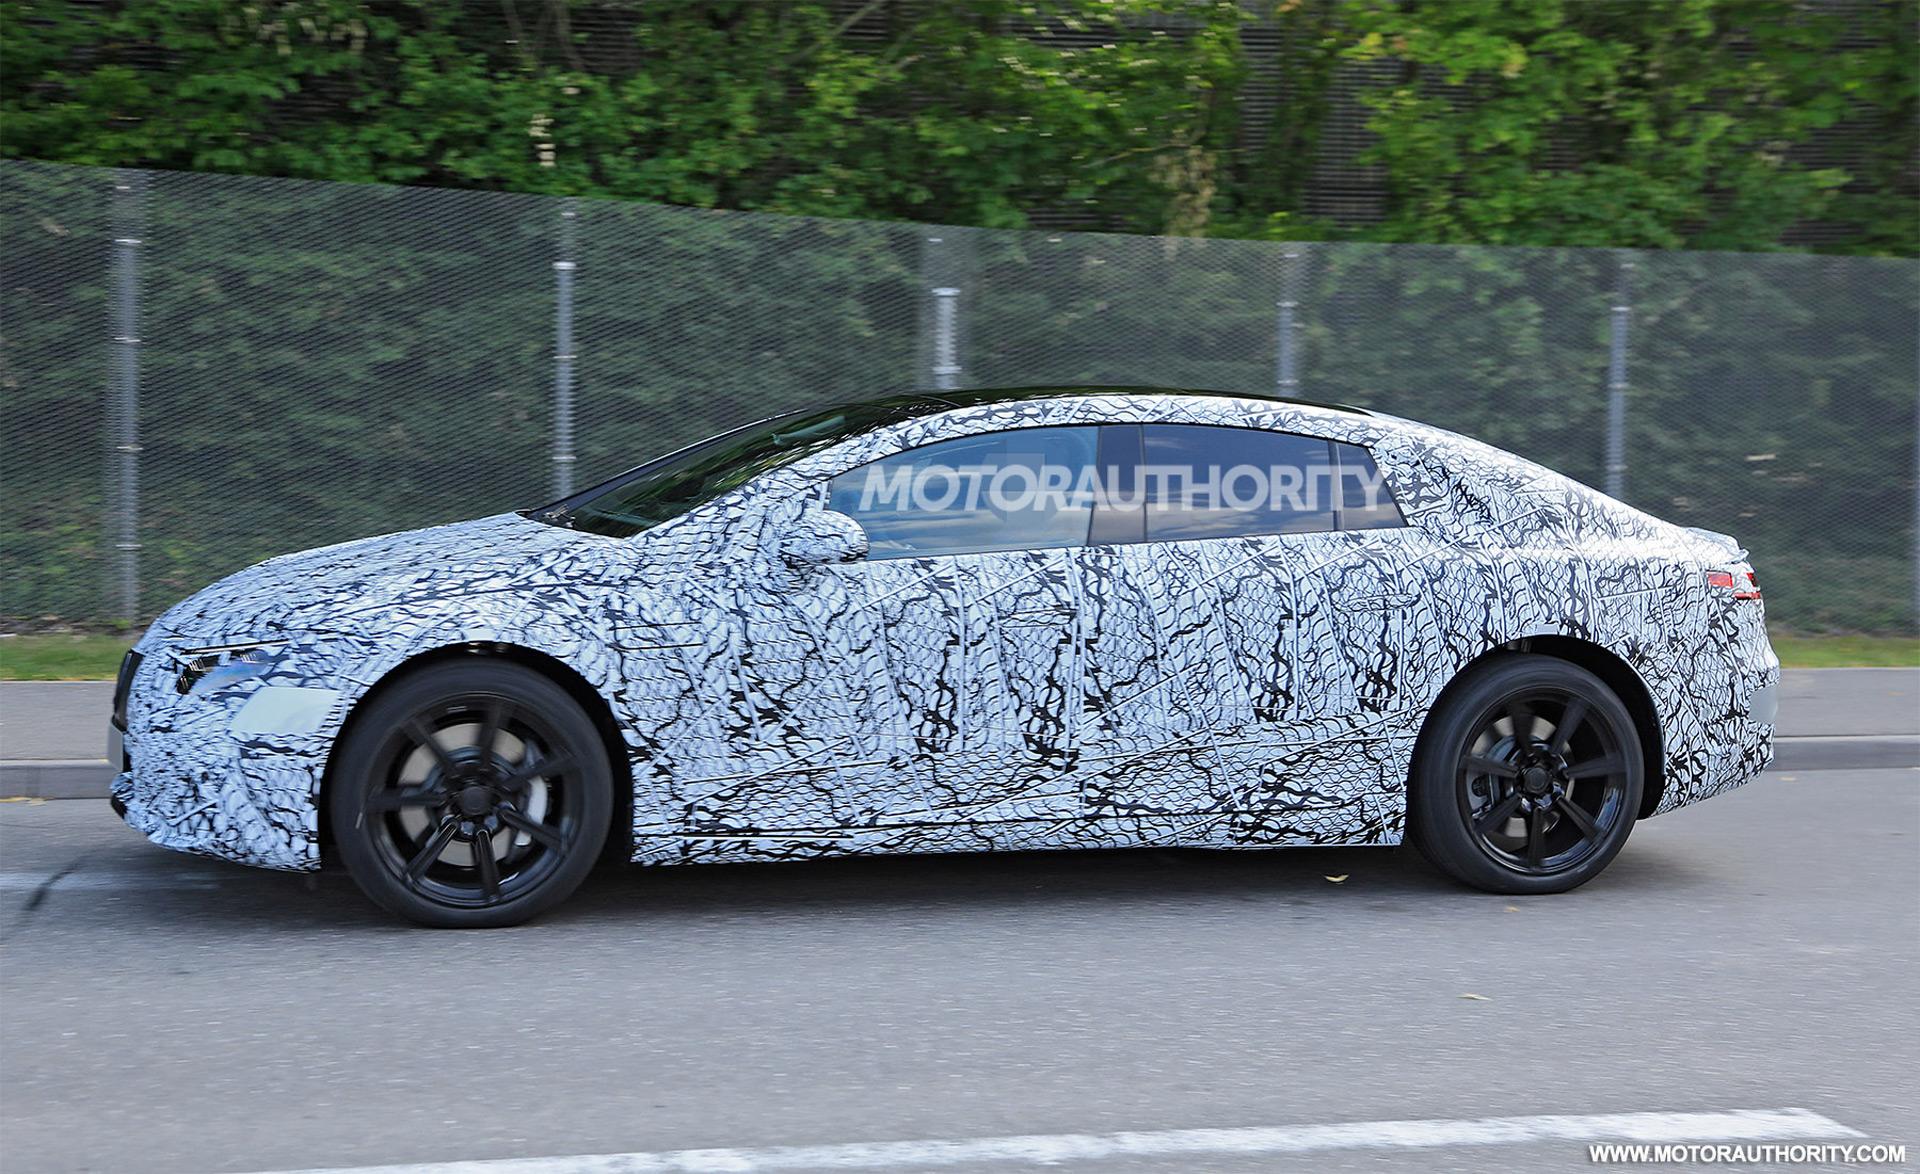 2020 - [Mercedes-Benz] EQ S - Page 4 2021-mercedes-benz-eqs-spy-shots--photo-credits-baldauf-sb-medien_100753406_h